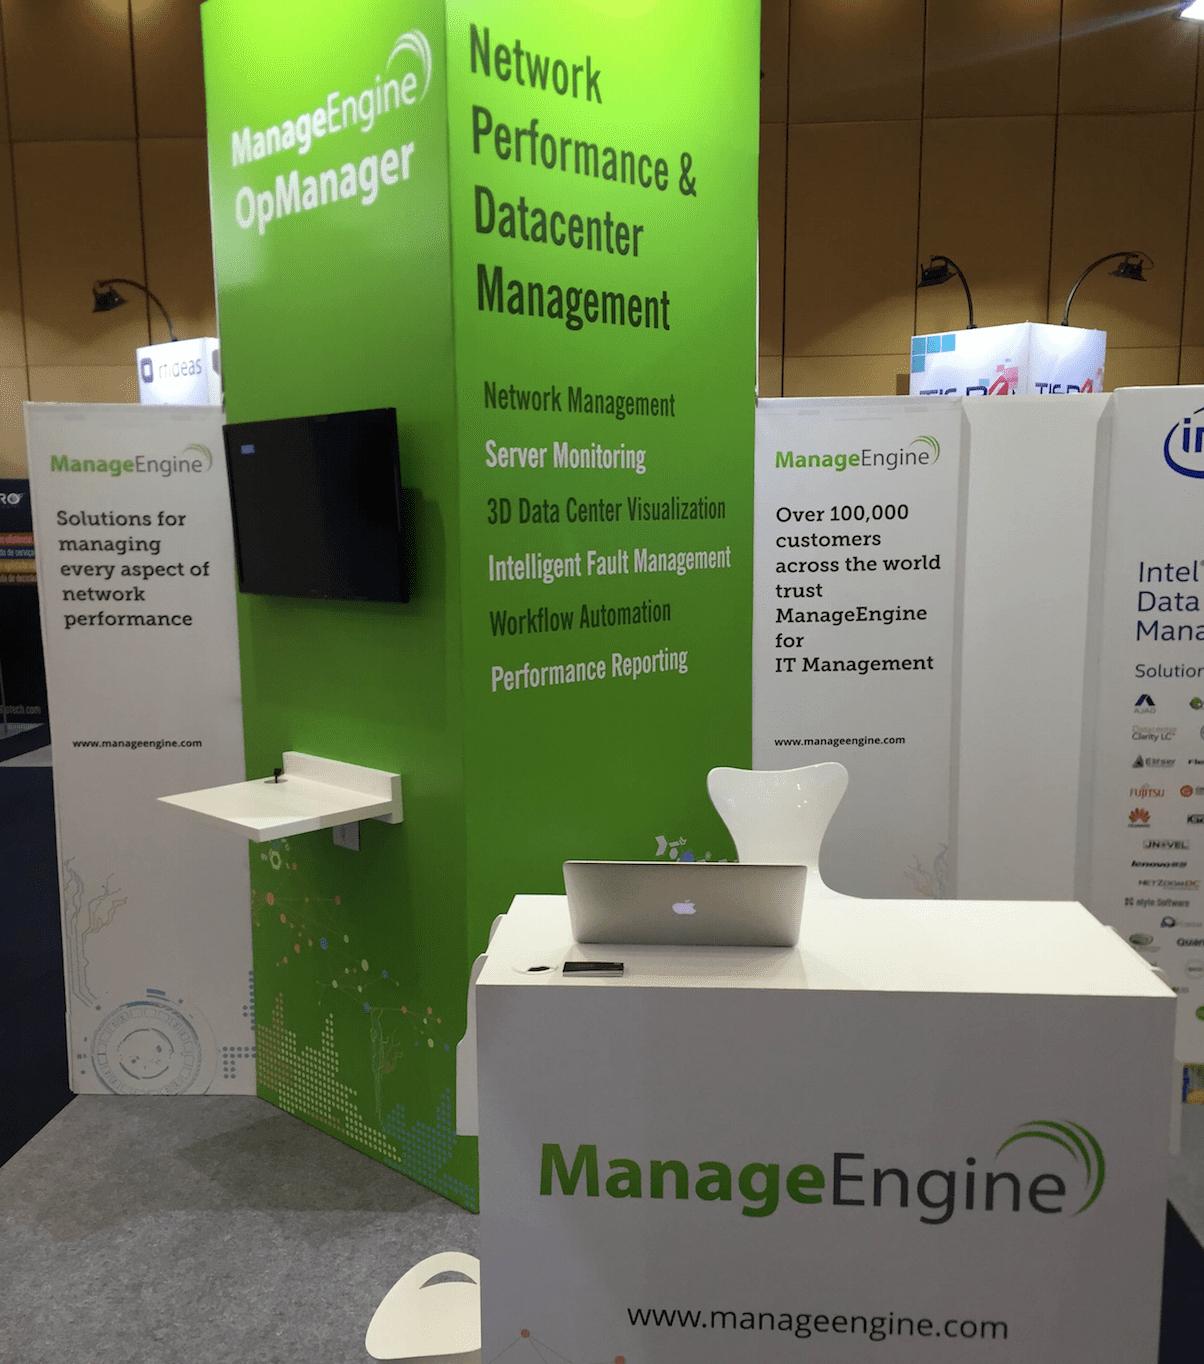 Estande ManageEngine - Conferência Gartner 2015